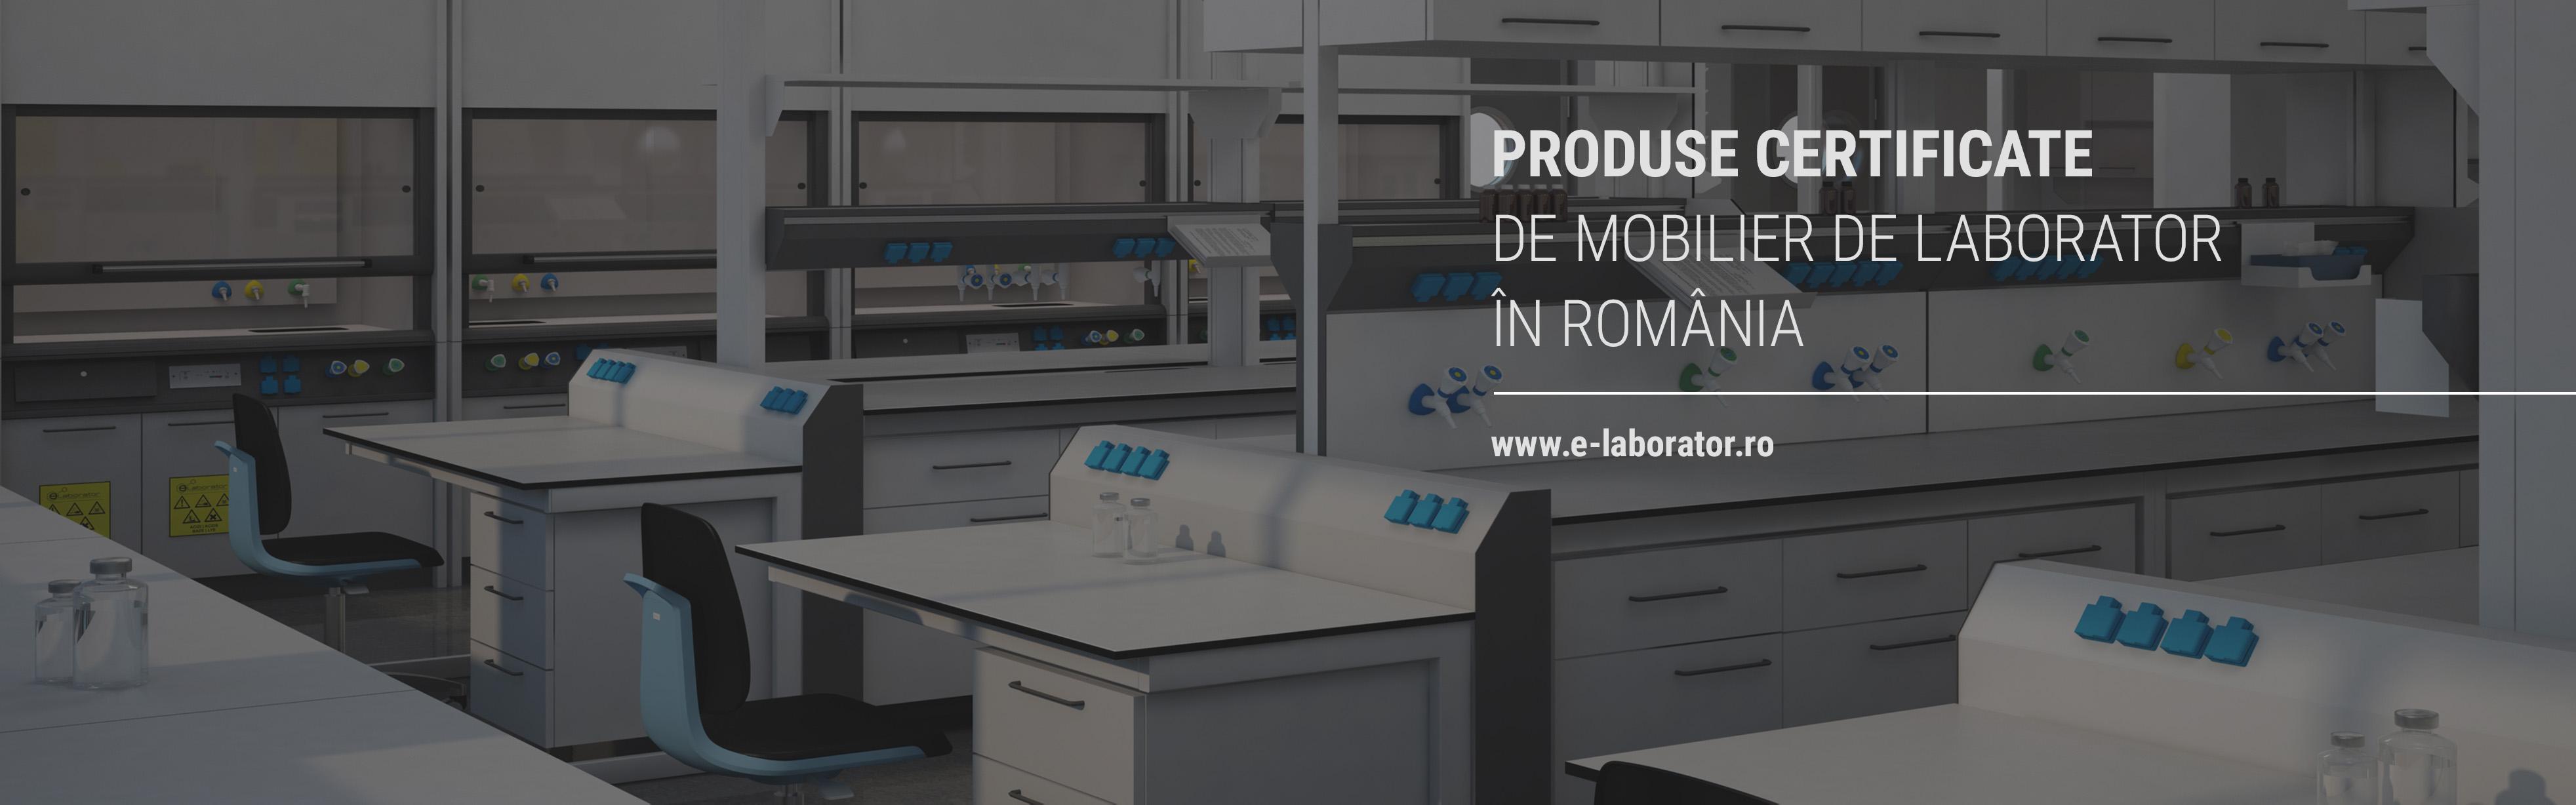 Mobilier de laborator aliniat la standarde europene